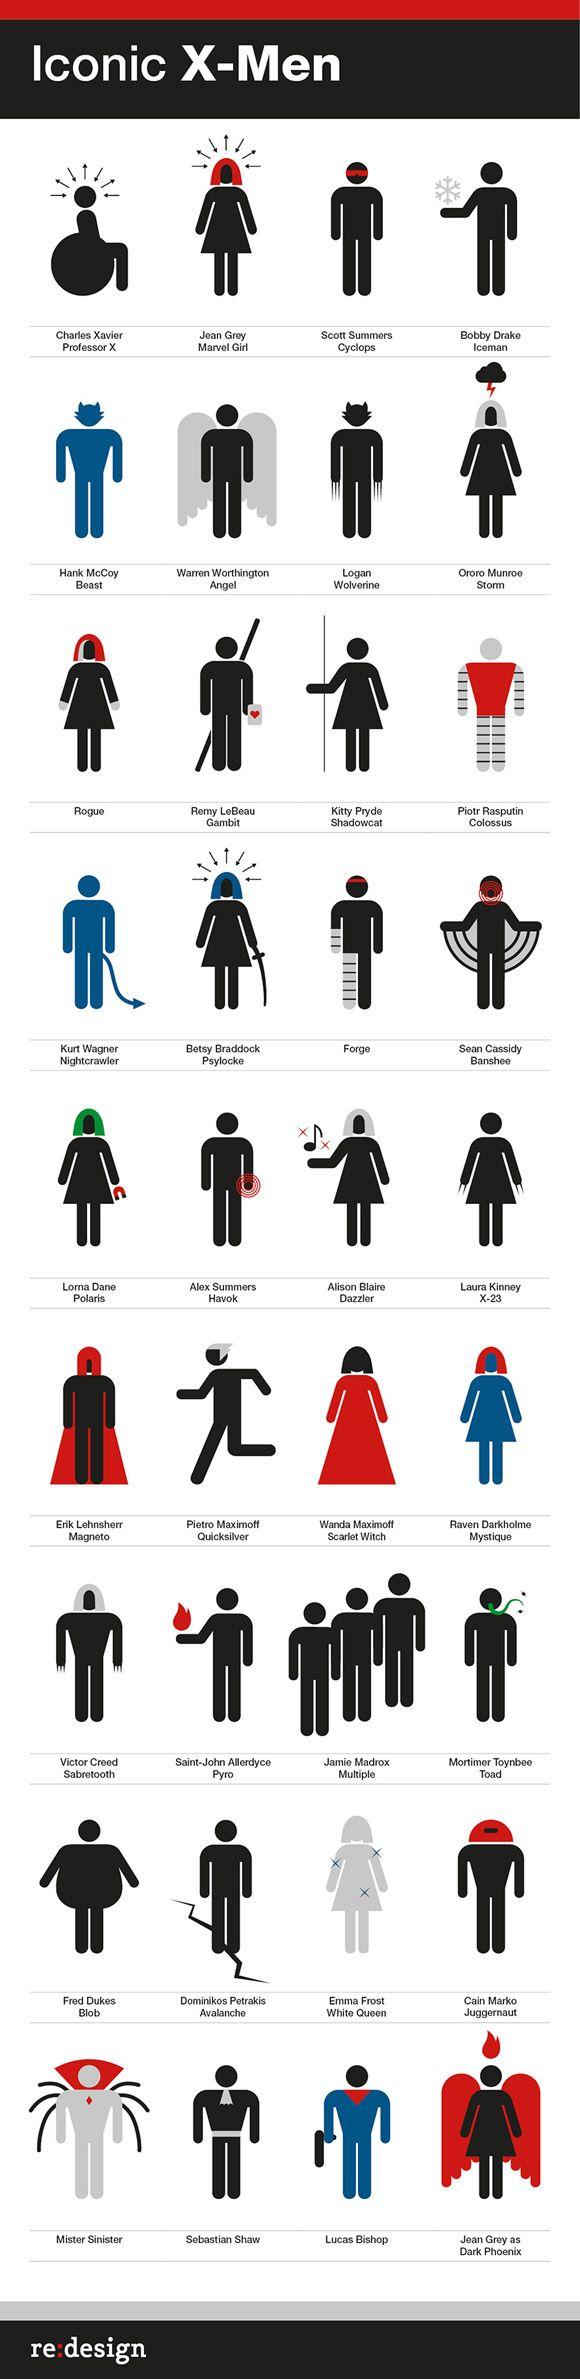 Superheroes-Supervillains-icons-03